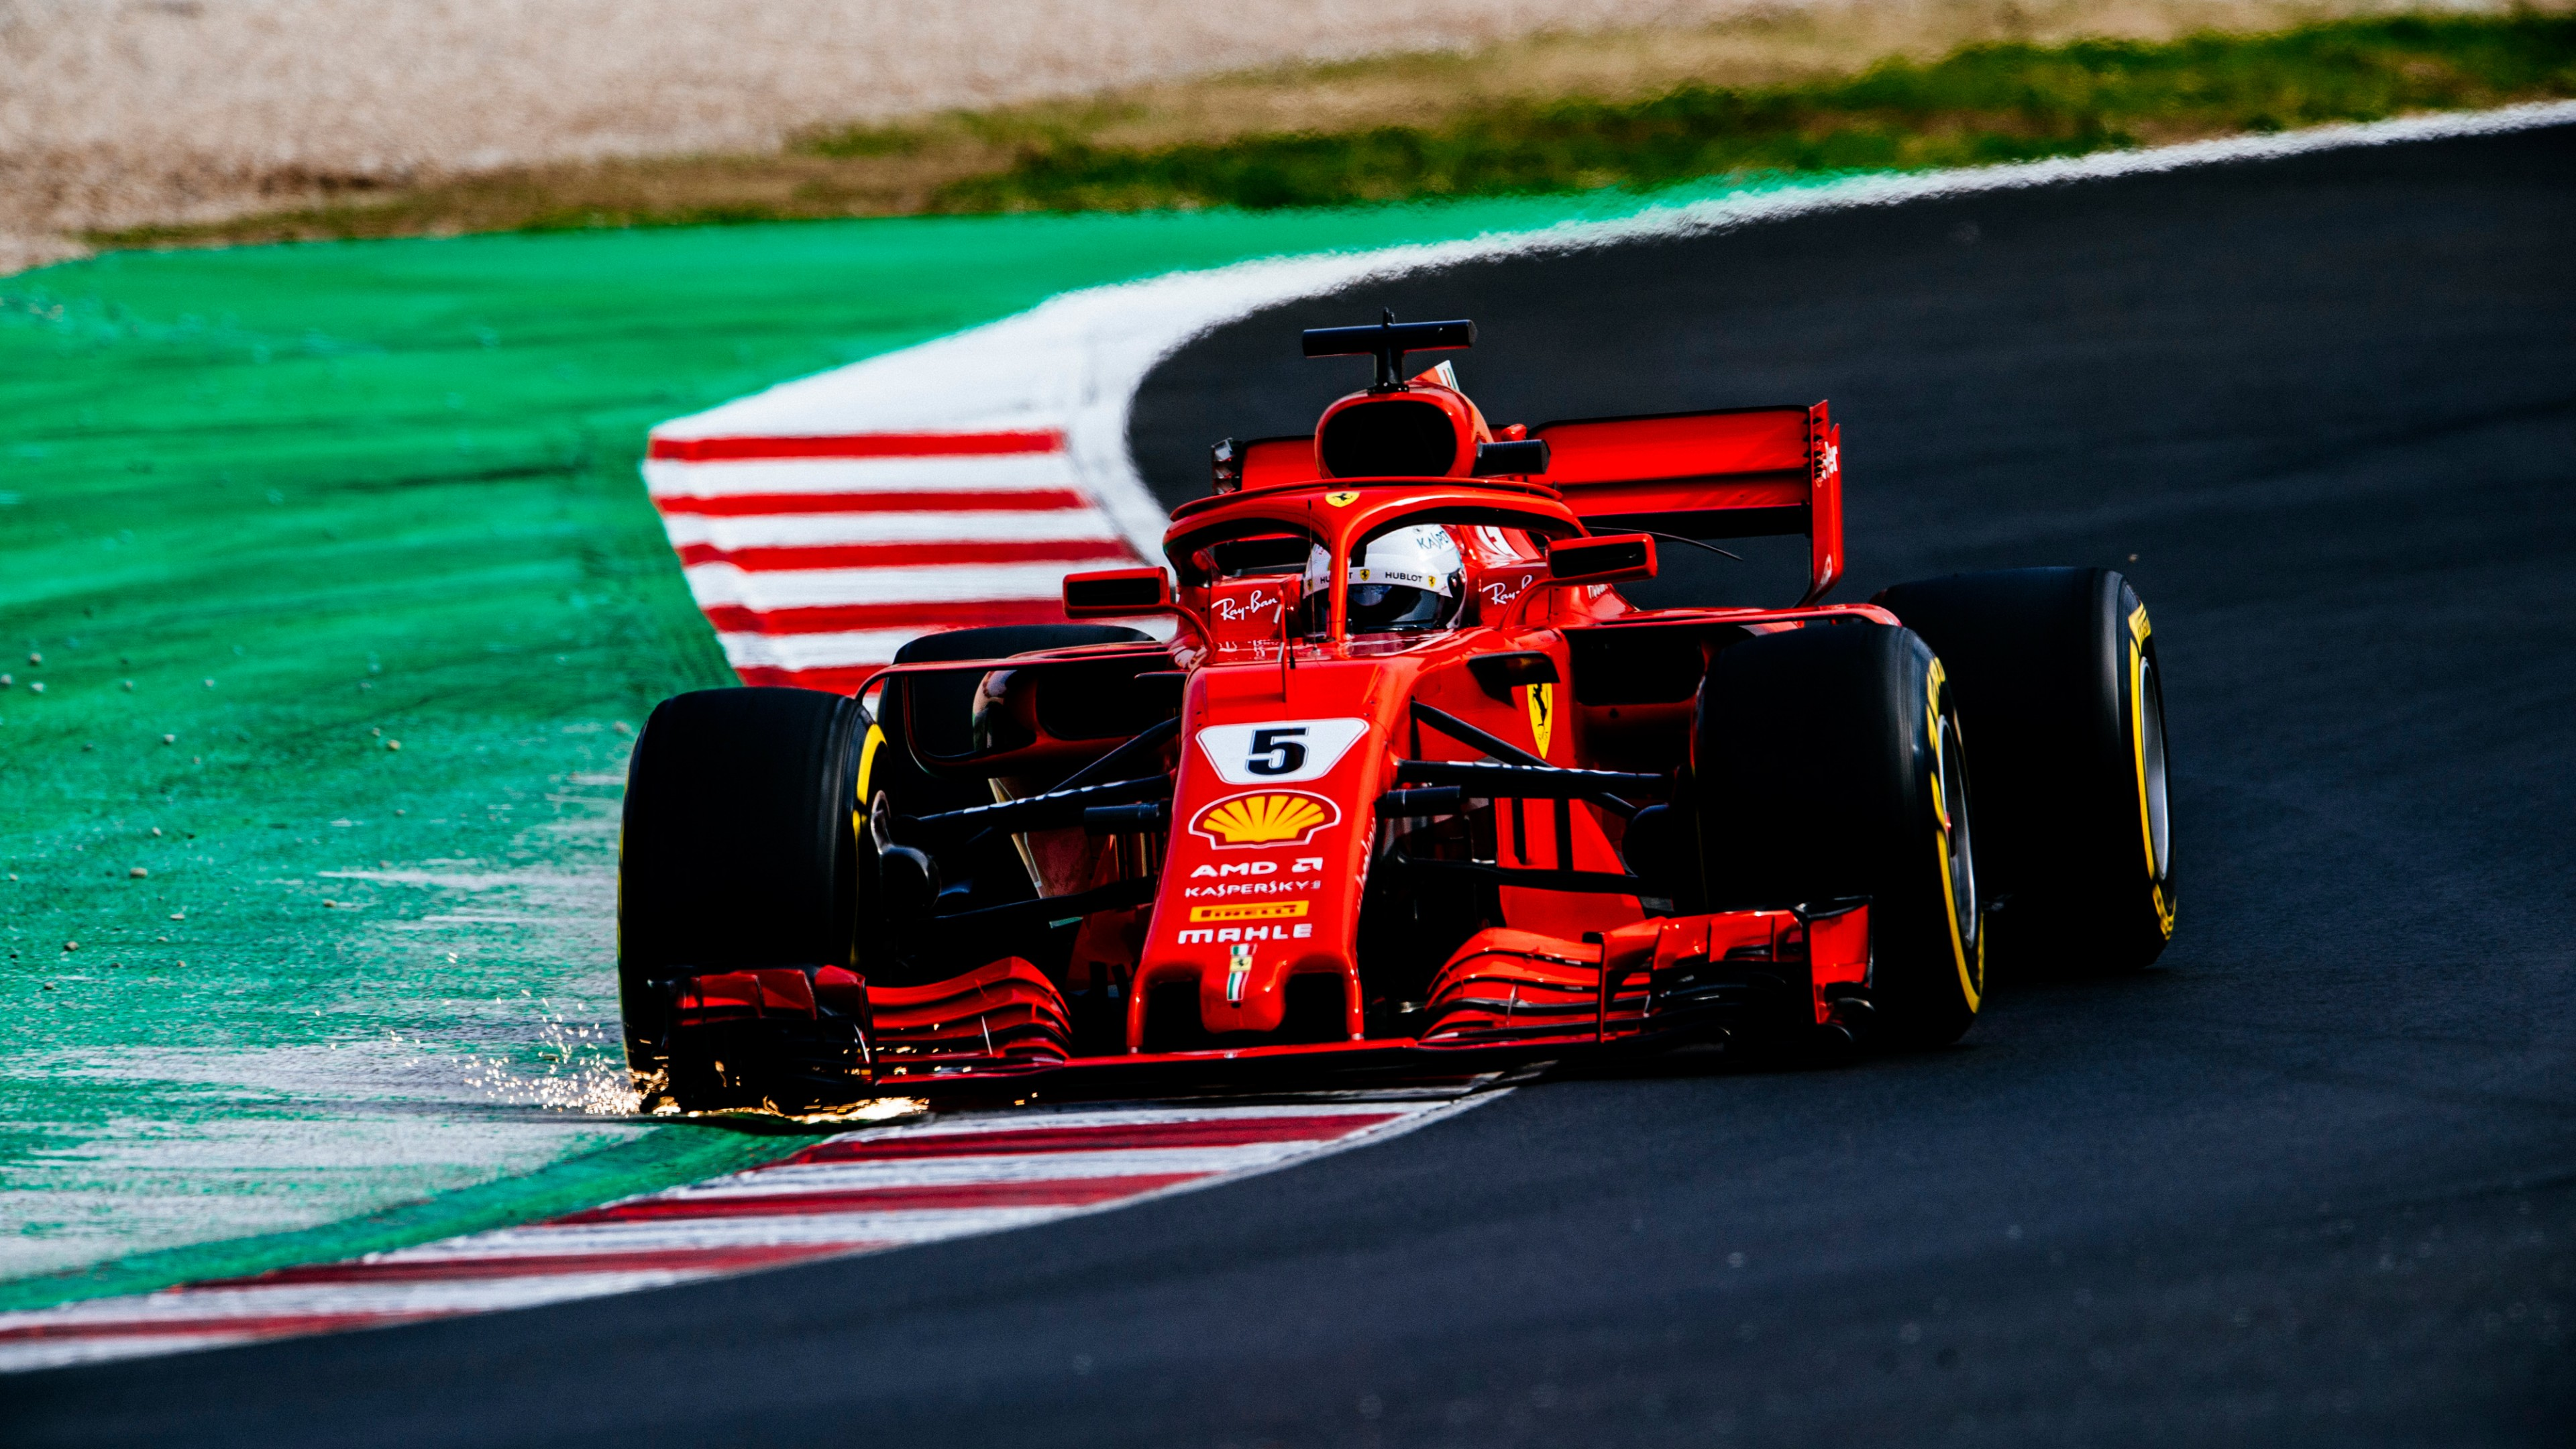 2018 Ferrari SF71H F1 Formula 1 4K 2 Wallpaper | HD Car ...